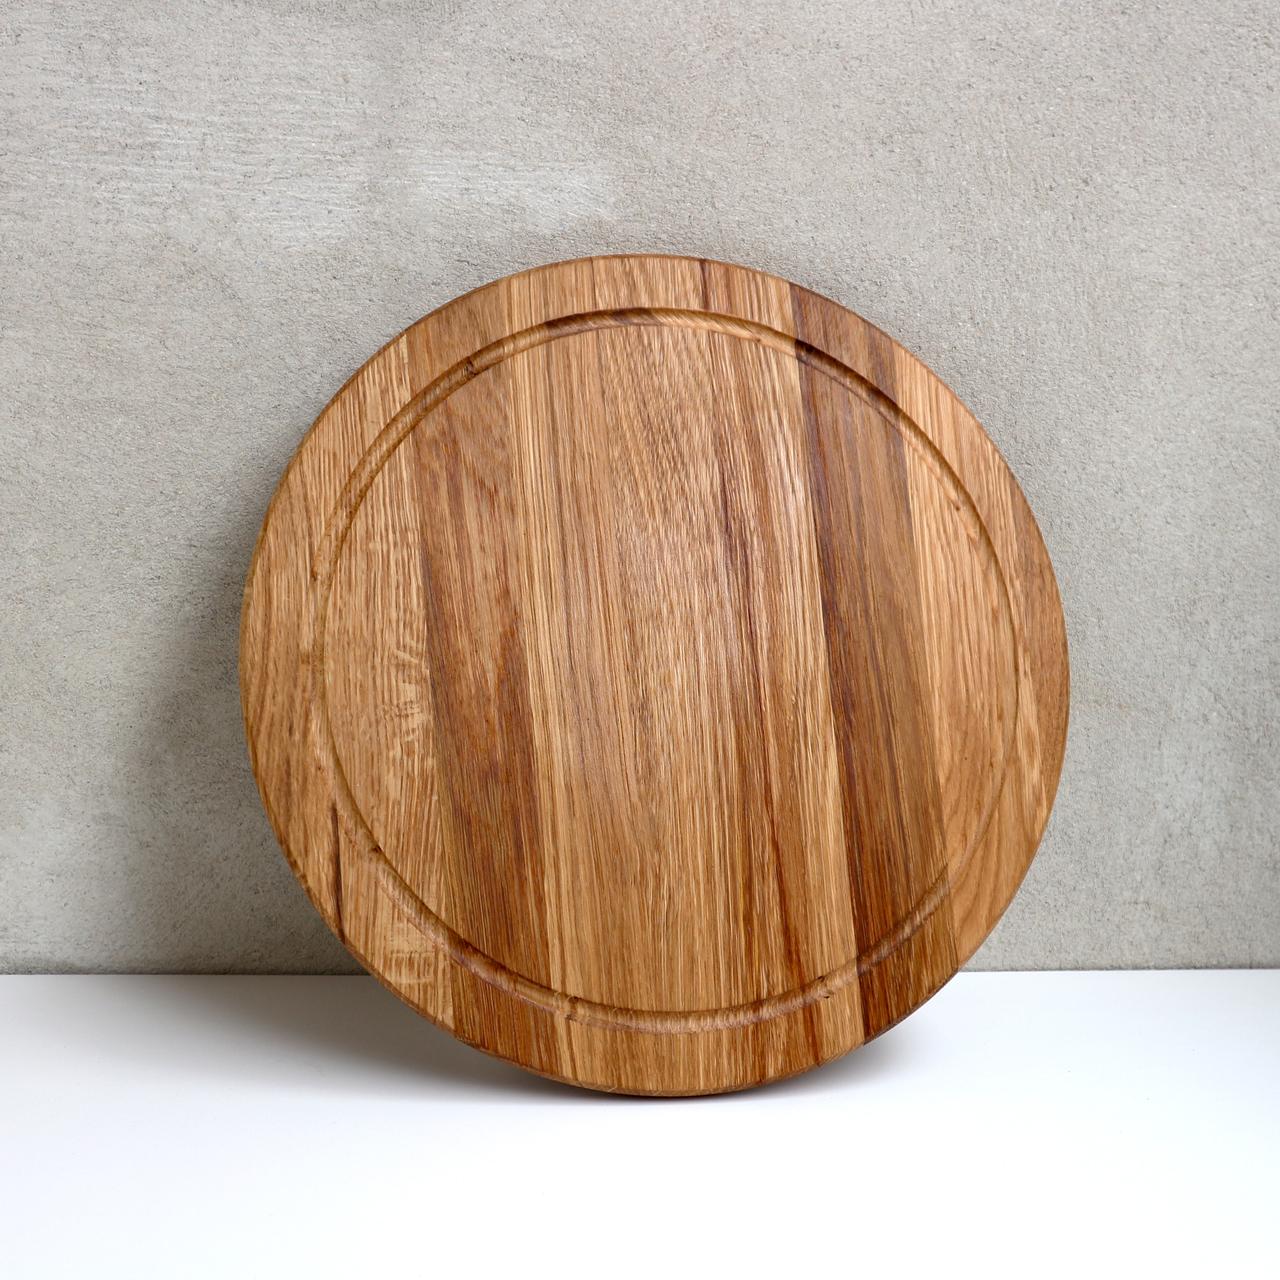 "Деревянная доска круглая ""Уран+"" Дуб Lasco 22 см диаметр"